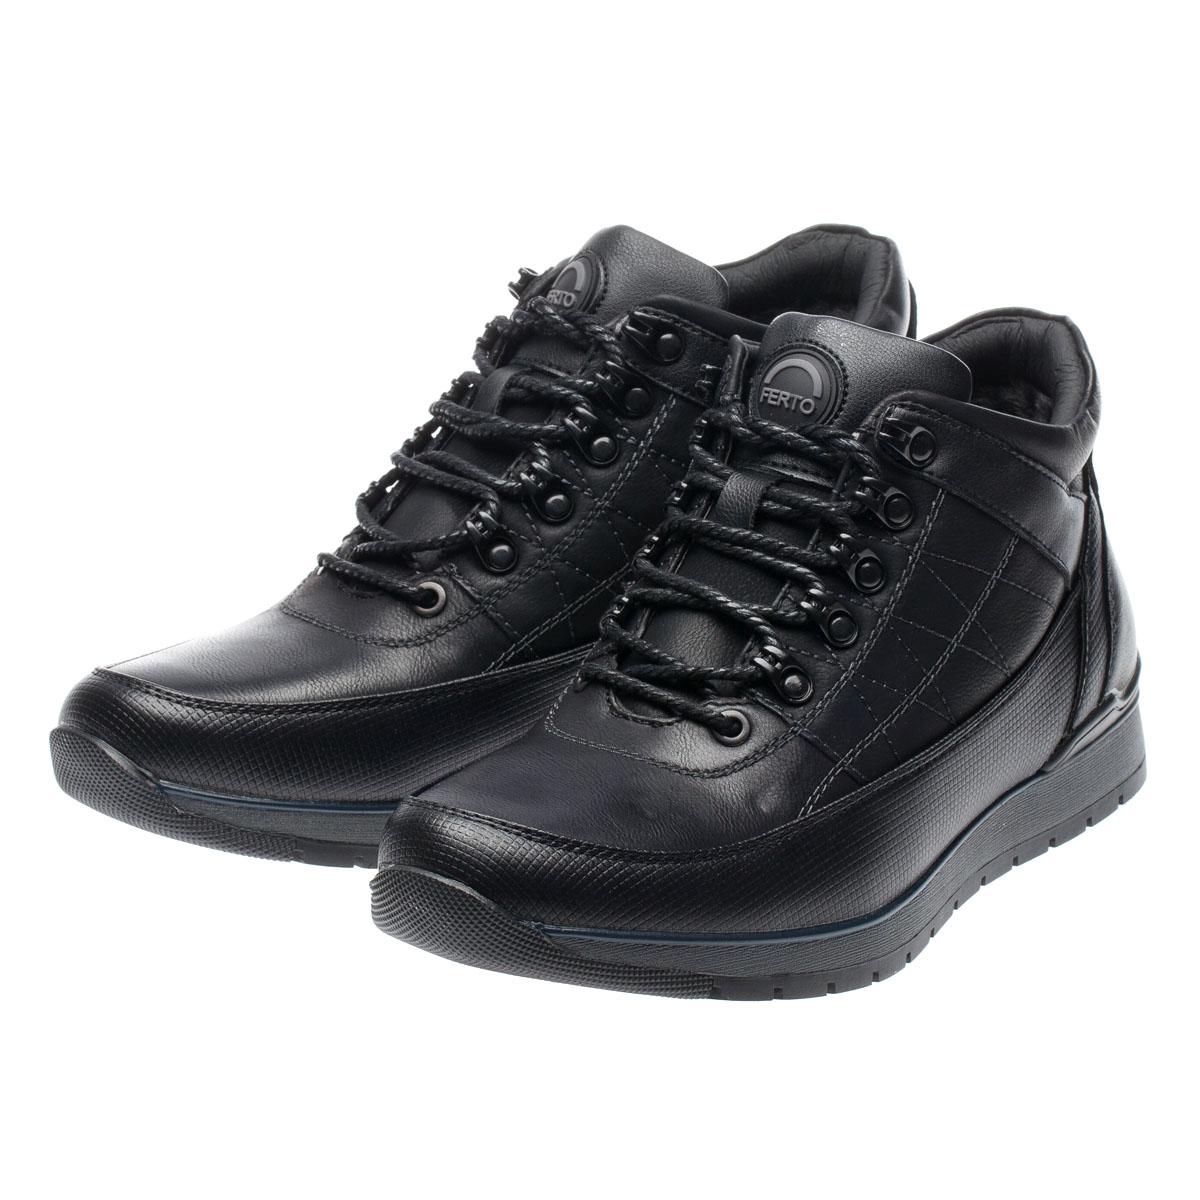 Ботинки зимние FERTO, 0628-3